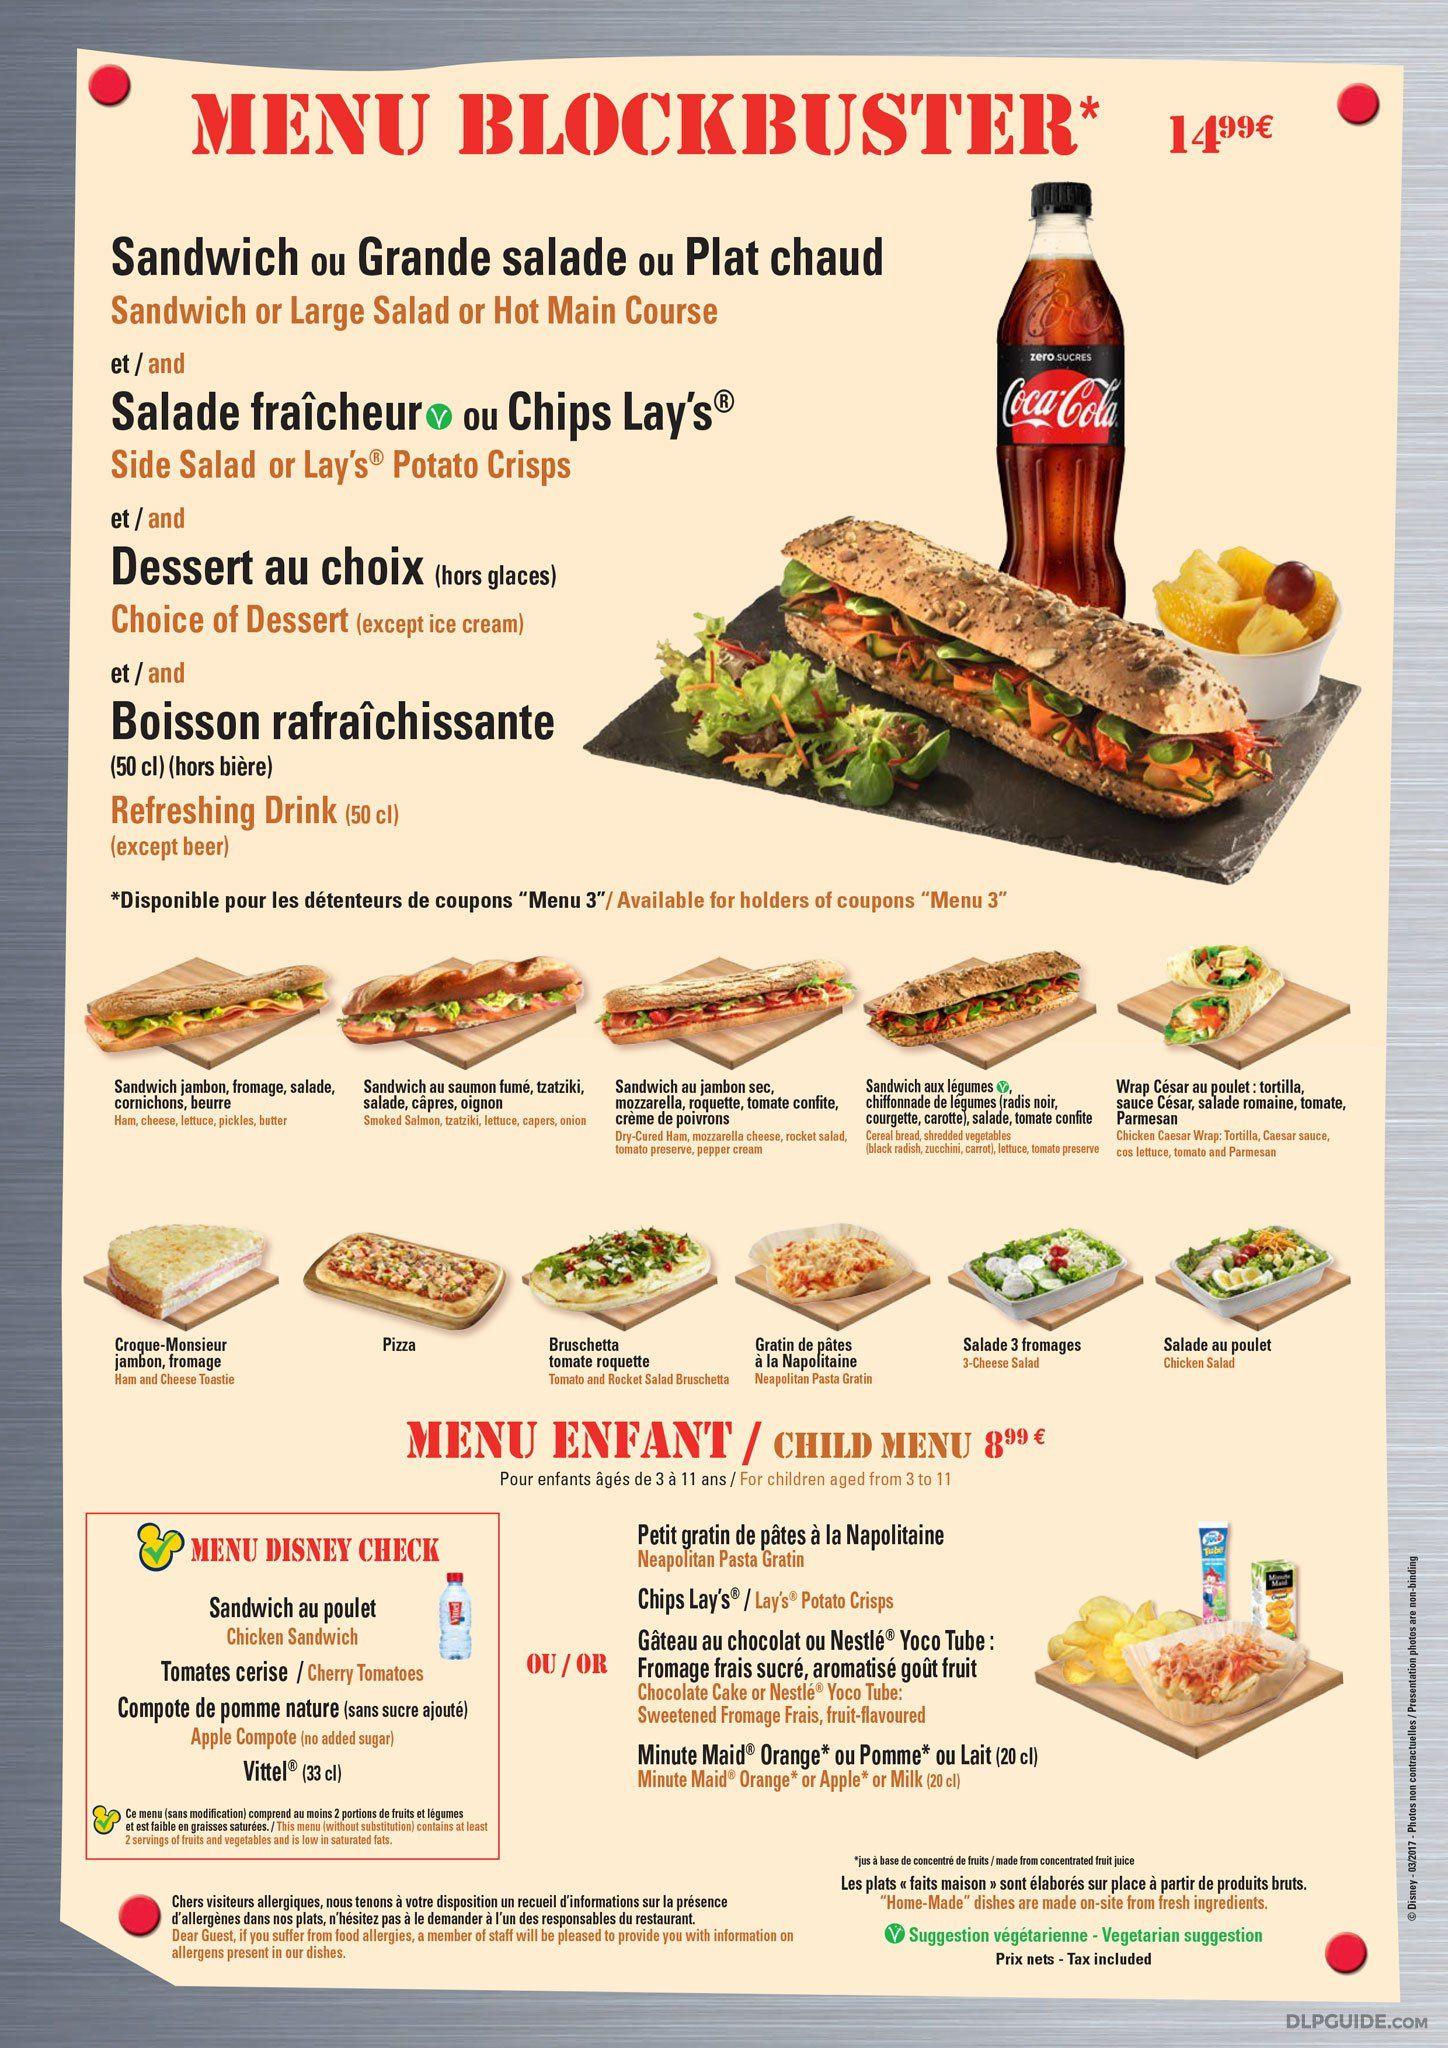 db7d24c427bef010843243c69e065ba2 - Plaza Gardens Restaurant Disneyland Paris Menu